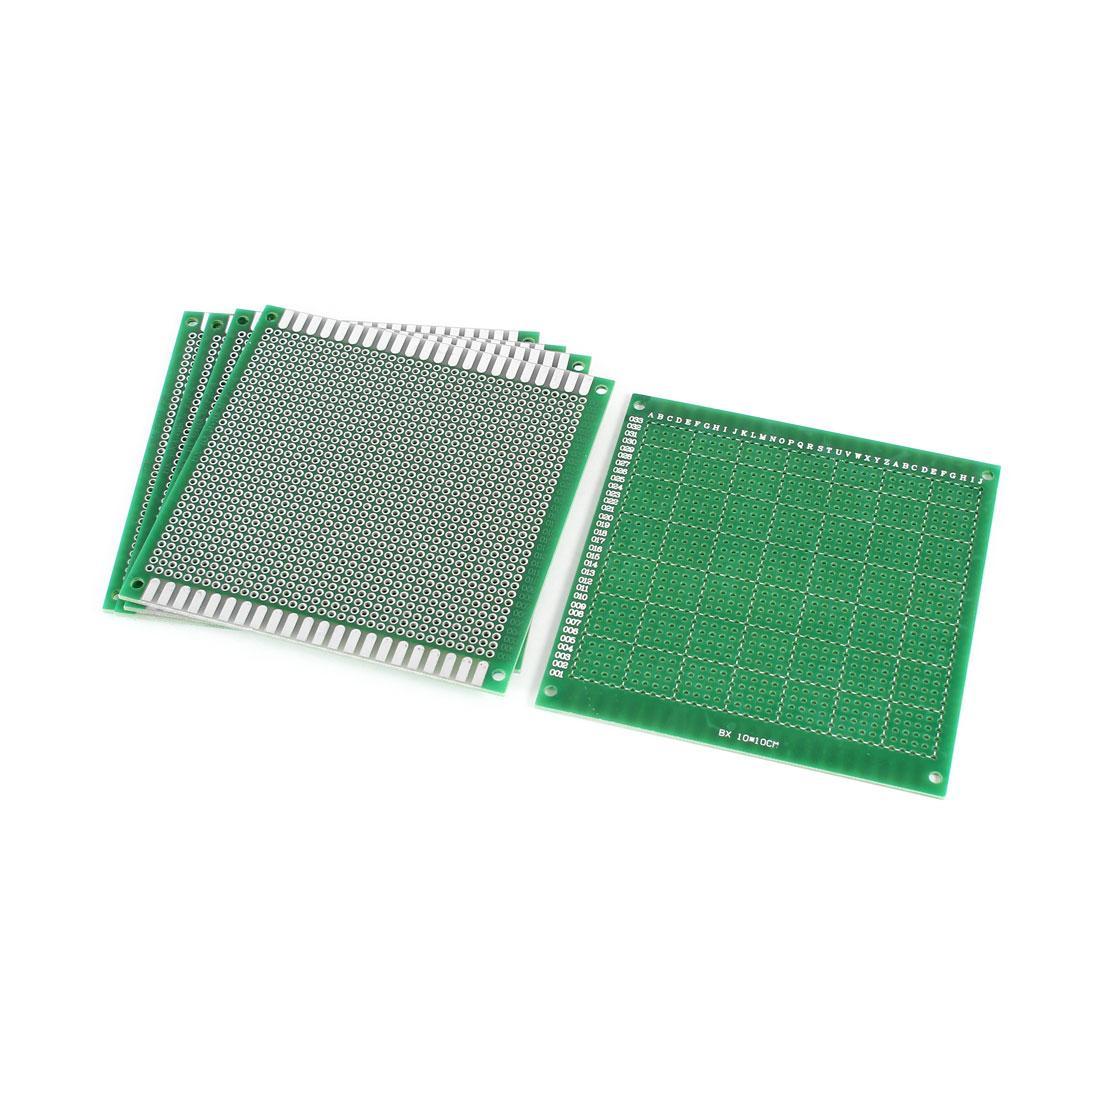 5 PCS 10cm x 10cm Green FR-4 One Side Prototypinge Paper DIY Universal PCB Print Circuit Board